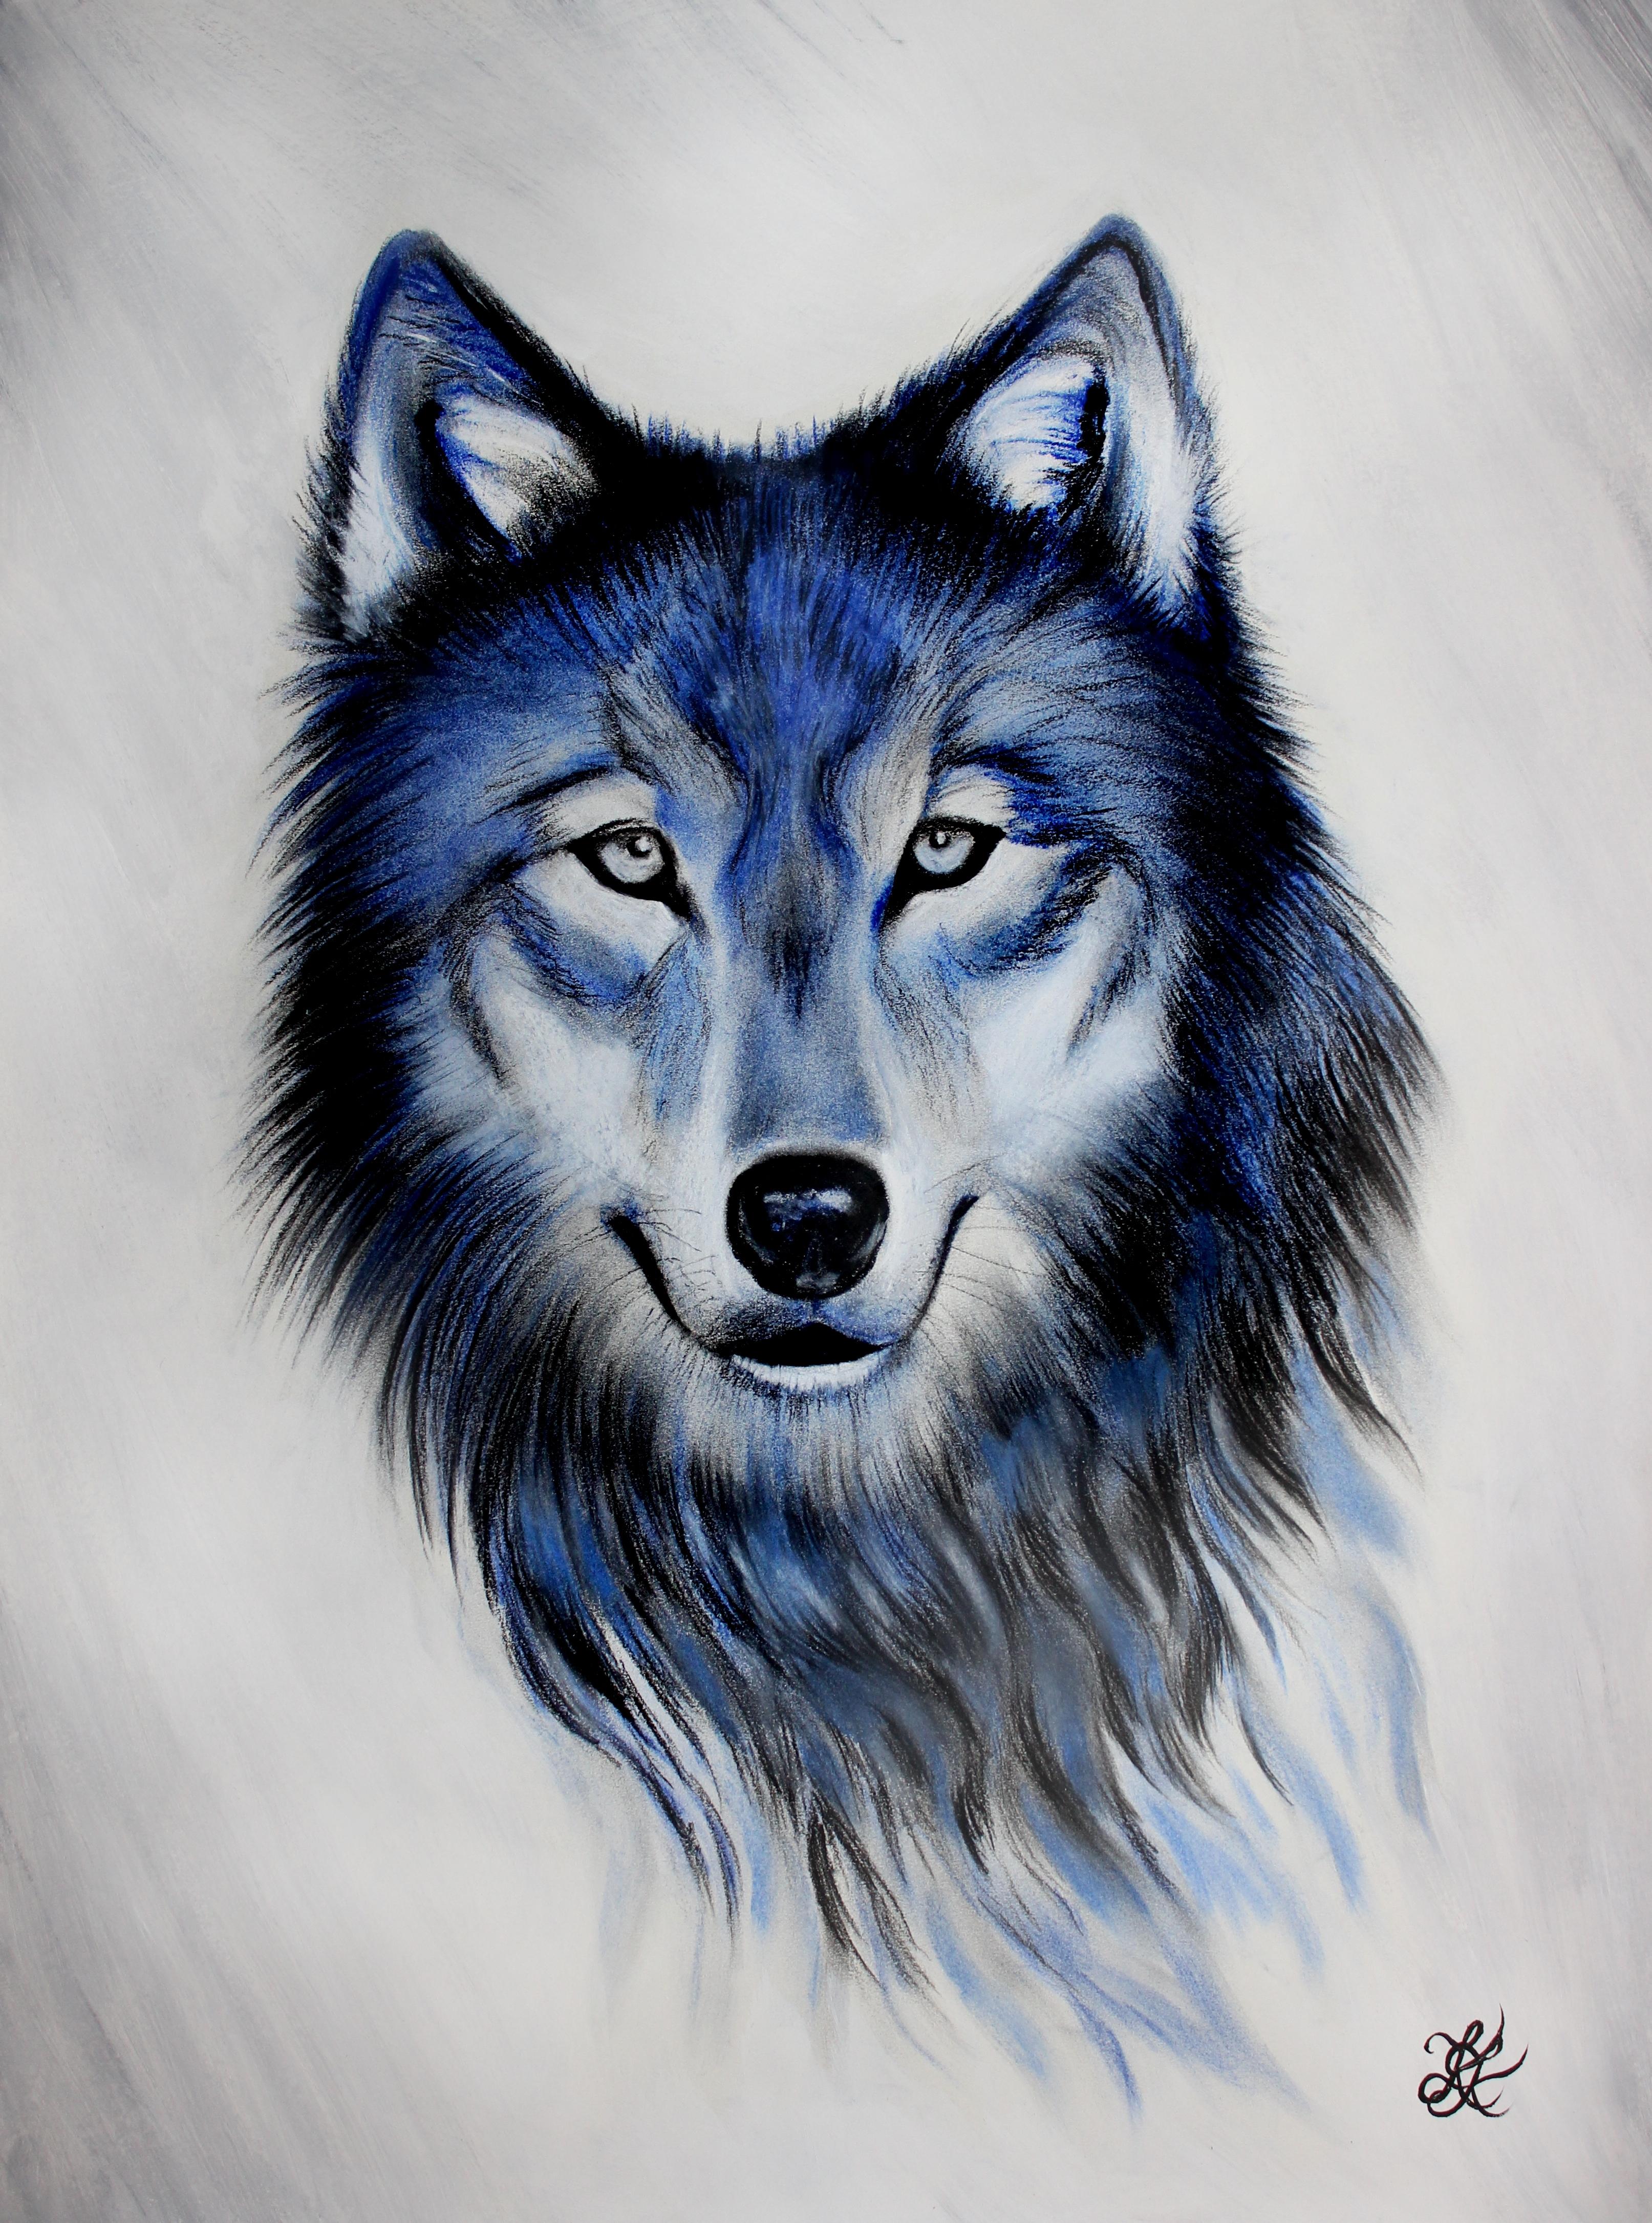 Creature of Loyalty (Edited jpg)